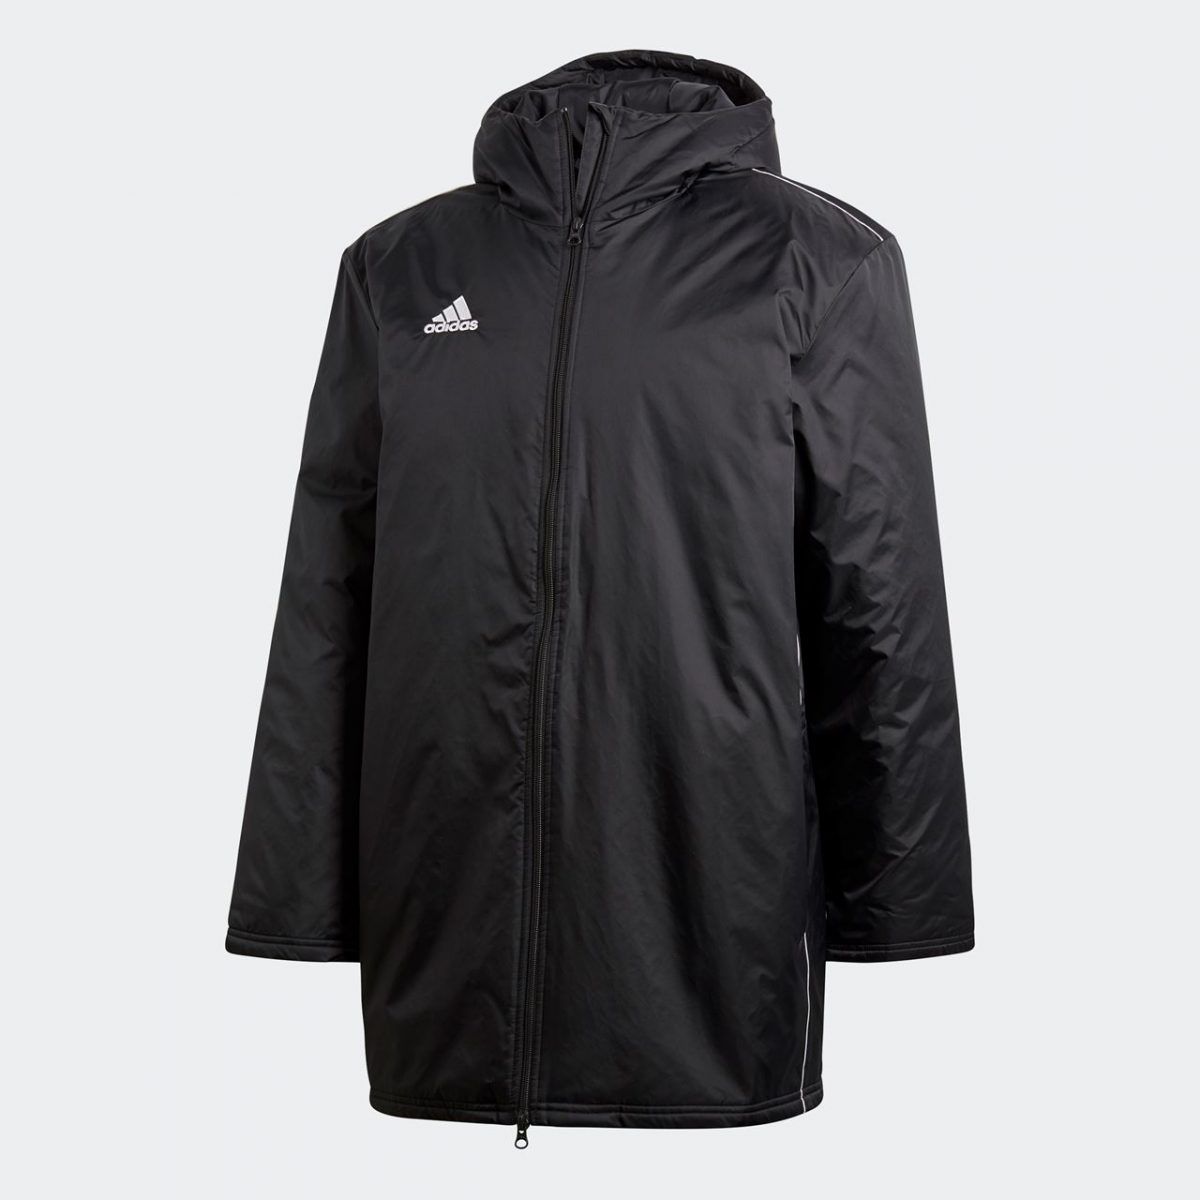 Adidas Core 18 Stadium Jacket Adult